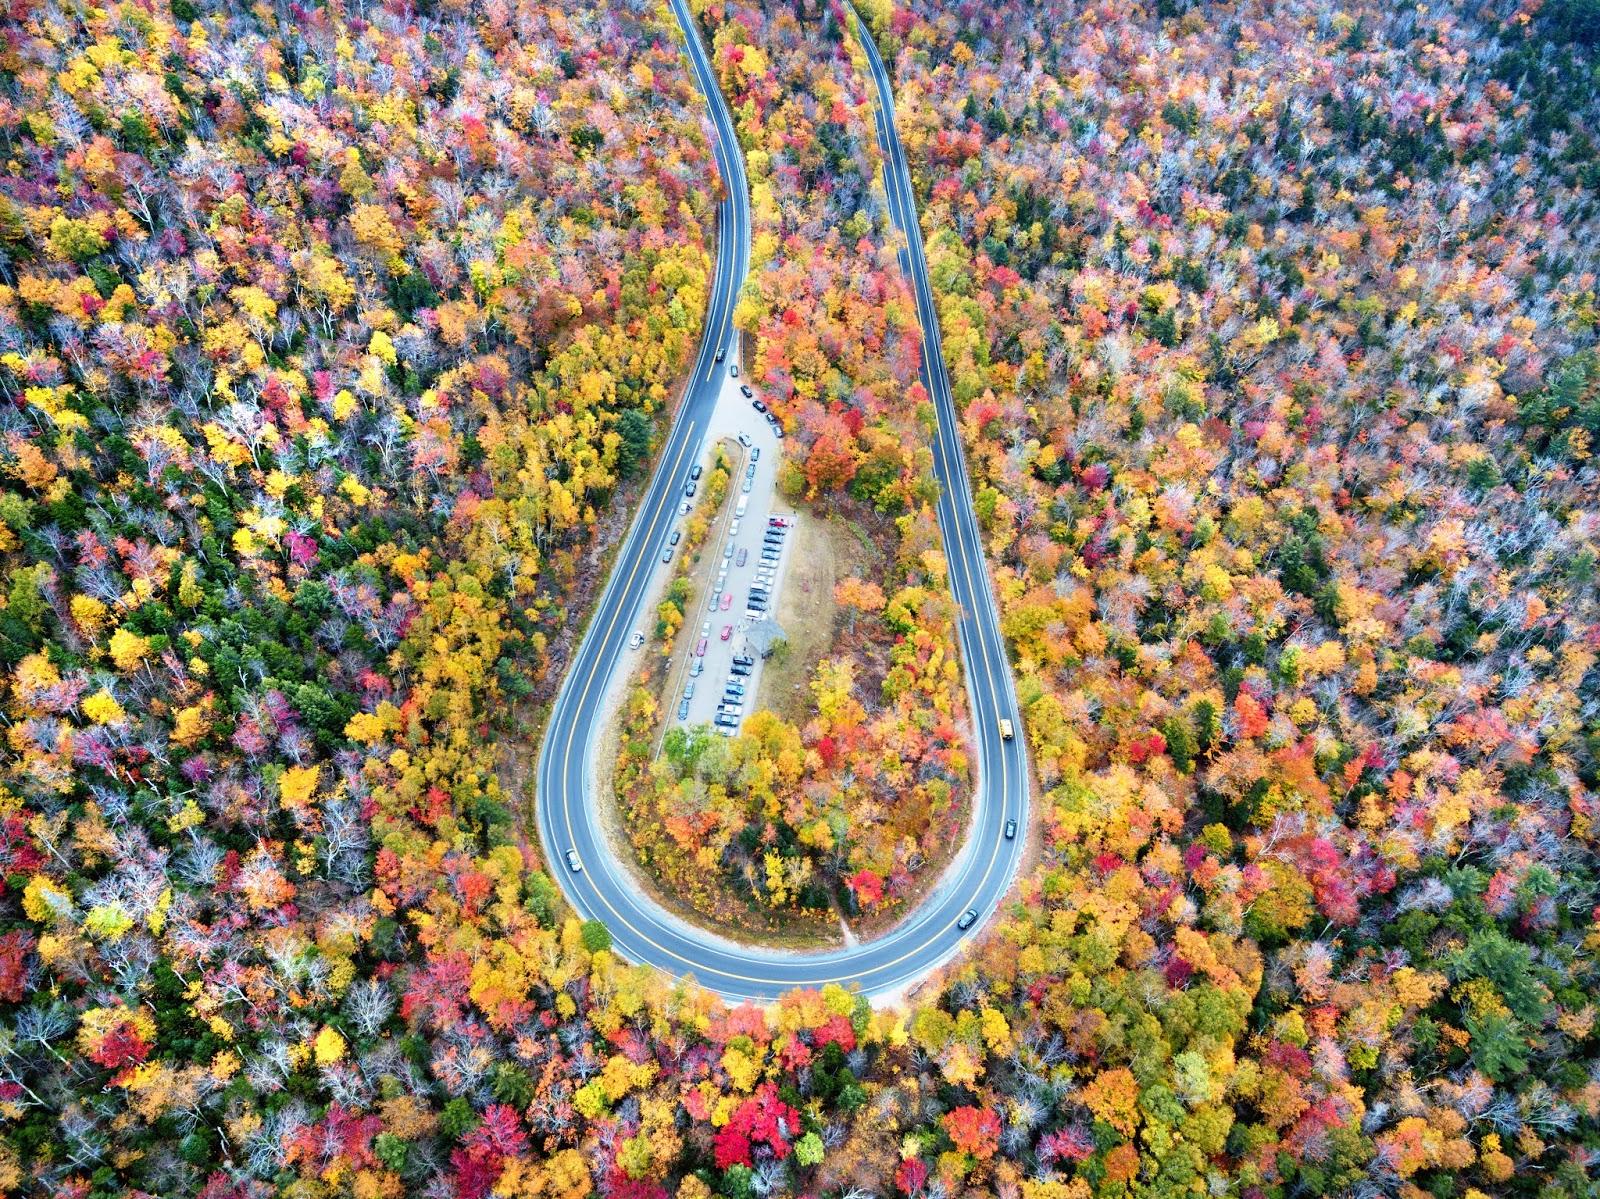 Northeast: Kancamahus Highway